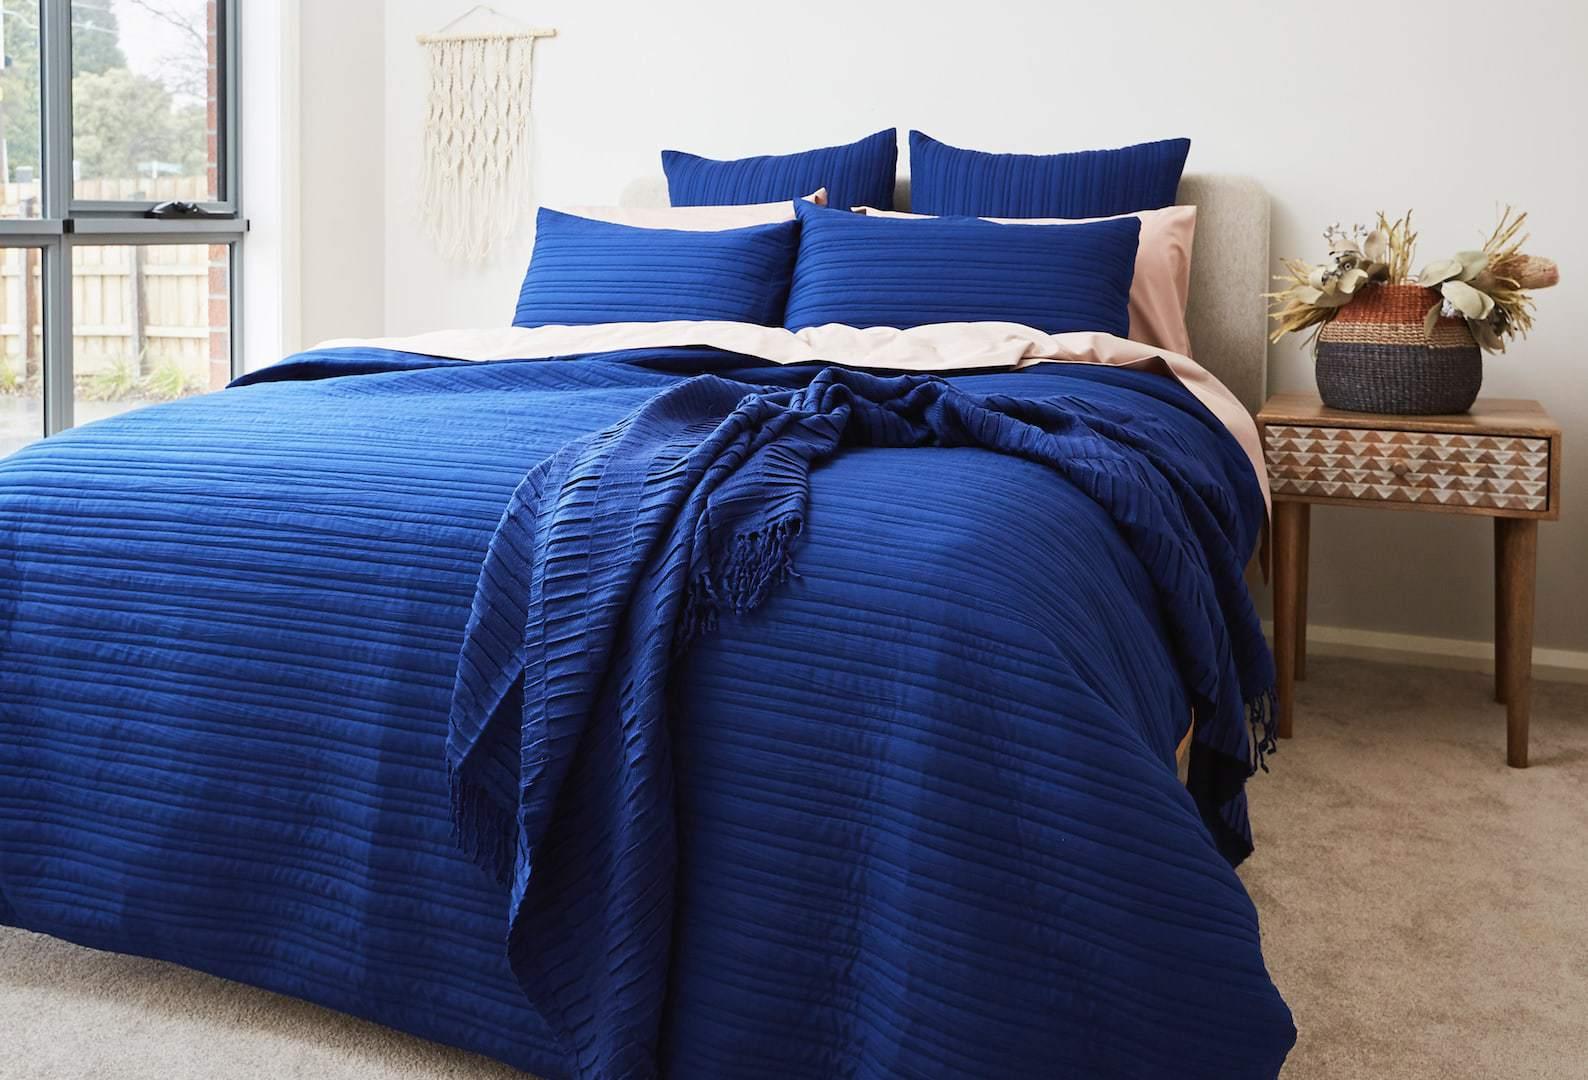 blue coastal bedroom ideas bright blue bedding set with macrame wall hanging lorraine lea